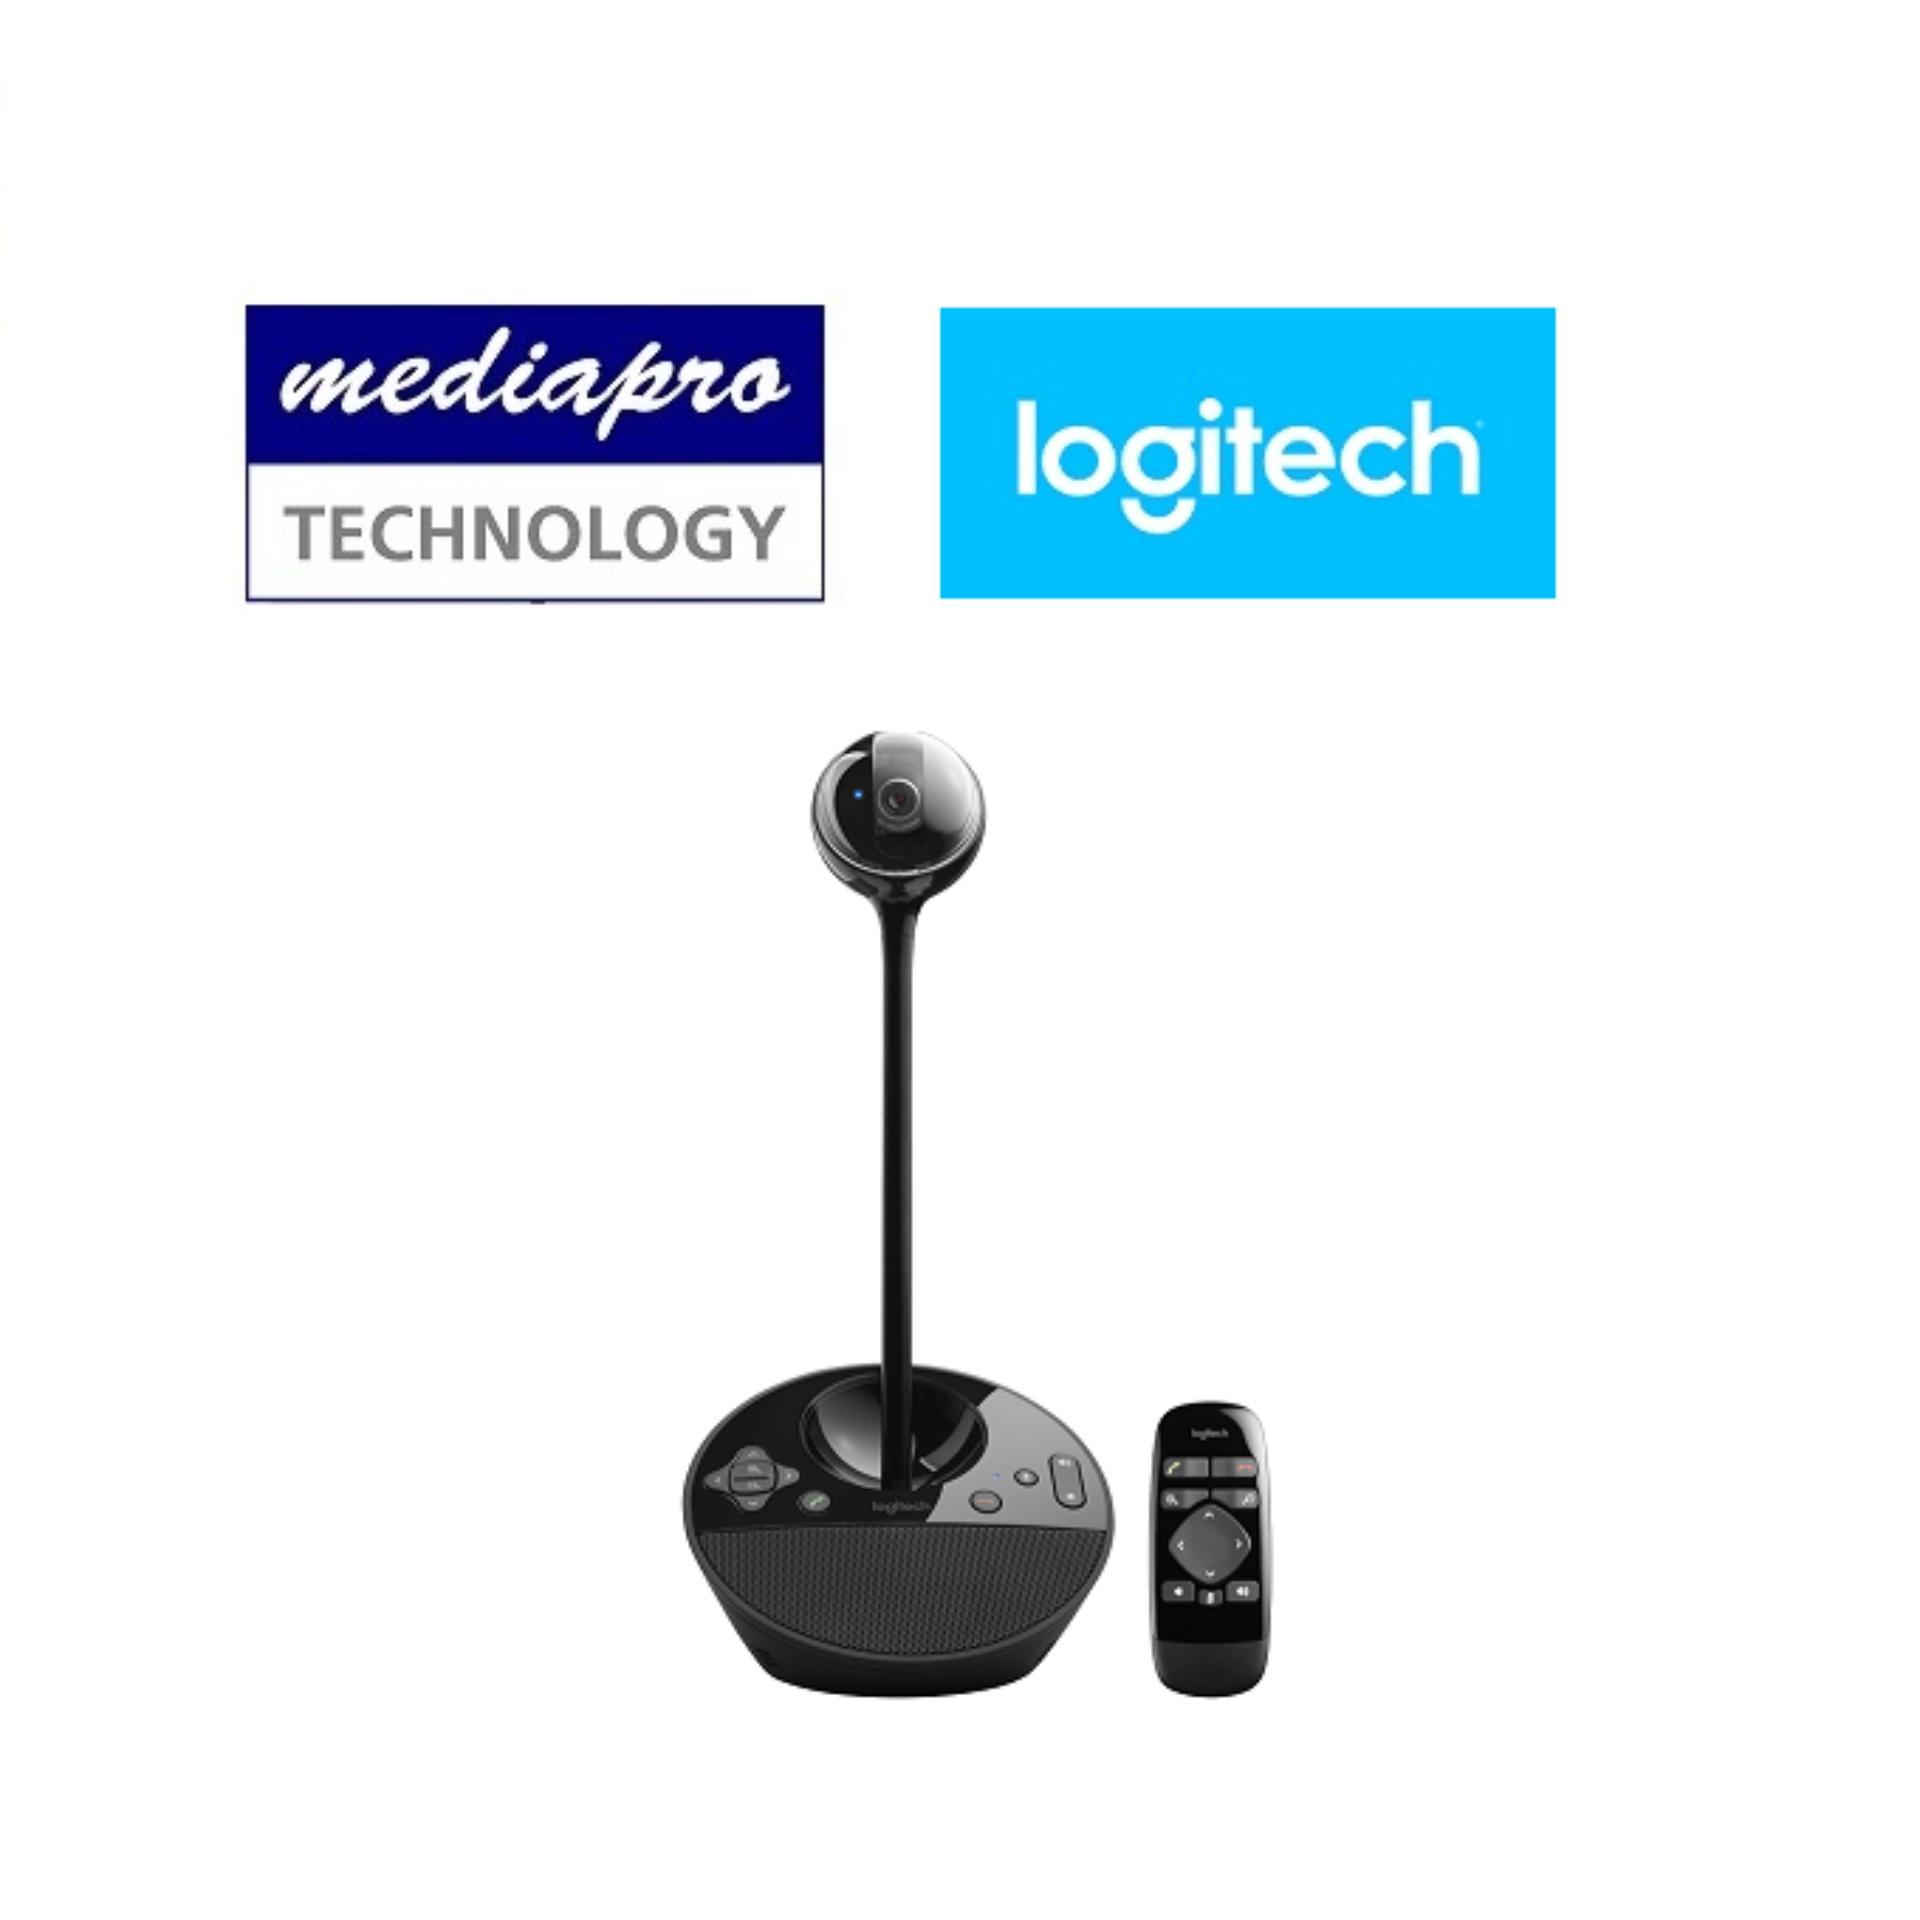 Logitech BCC950 ConferenceCam, Webcam, speakerphone, remote for groups of 1-4 people